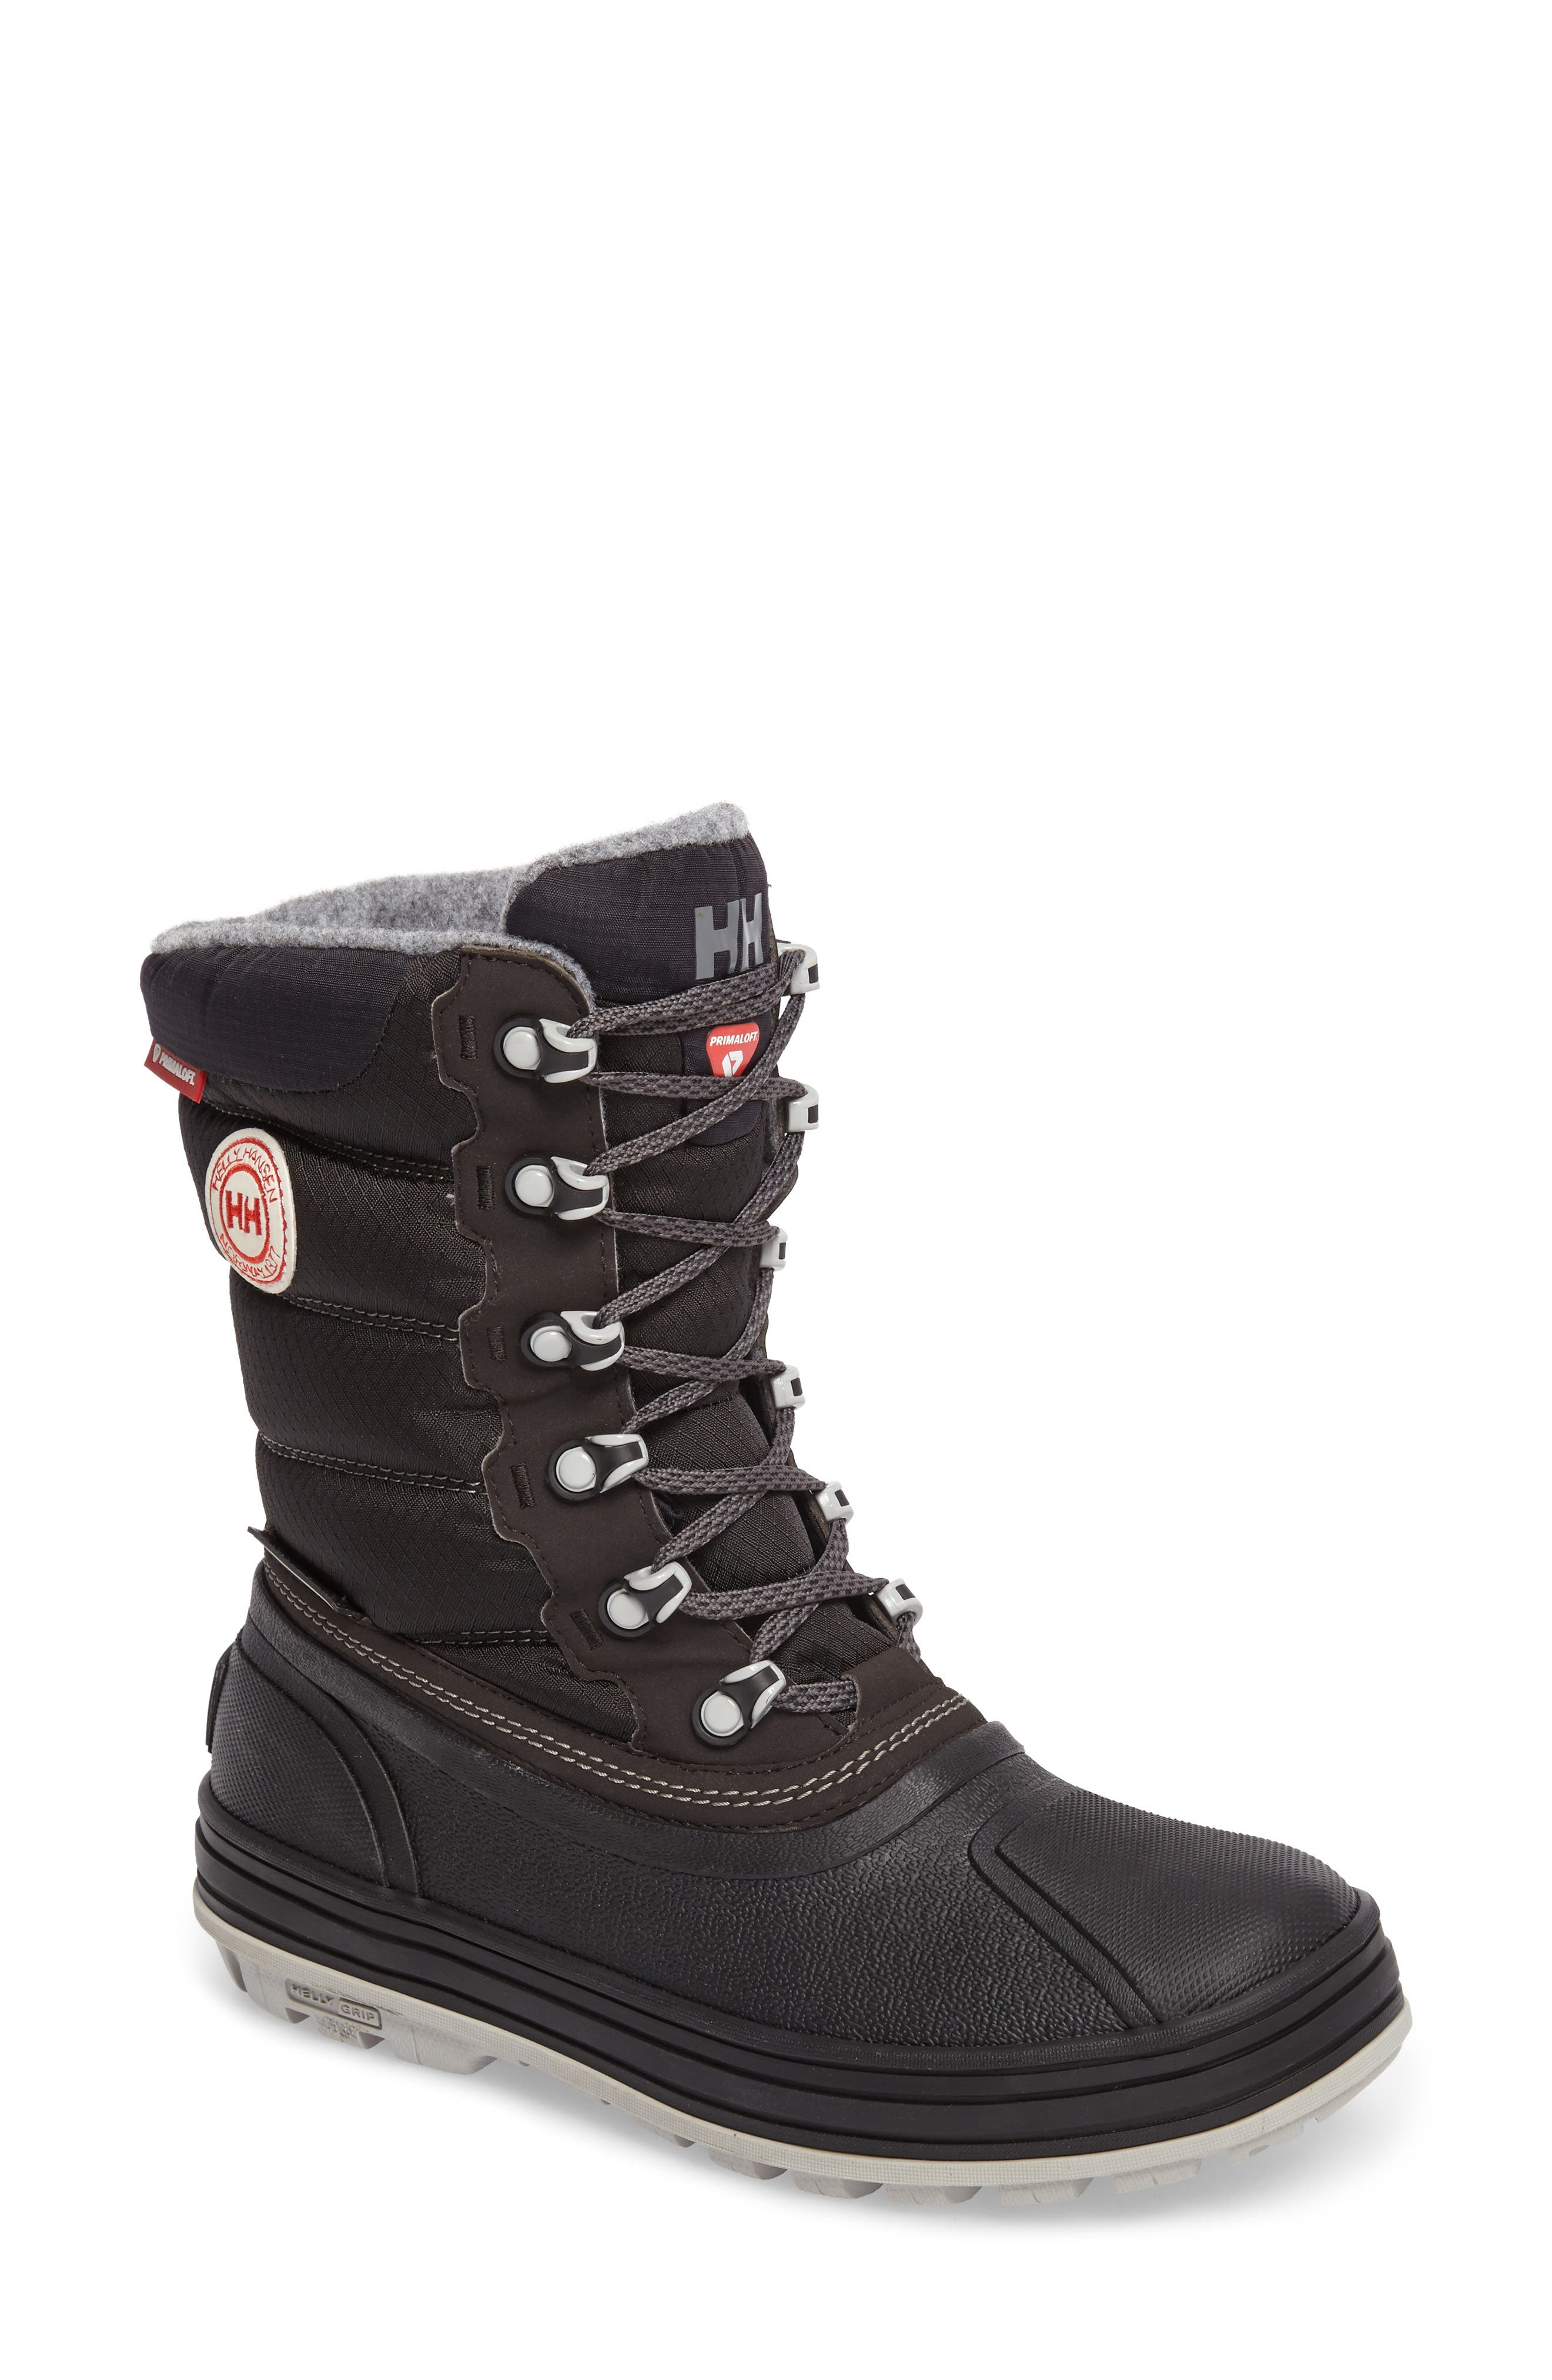 HELLY HANSEN Tundra Cwb Snow Boot in Jet Black